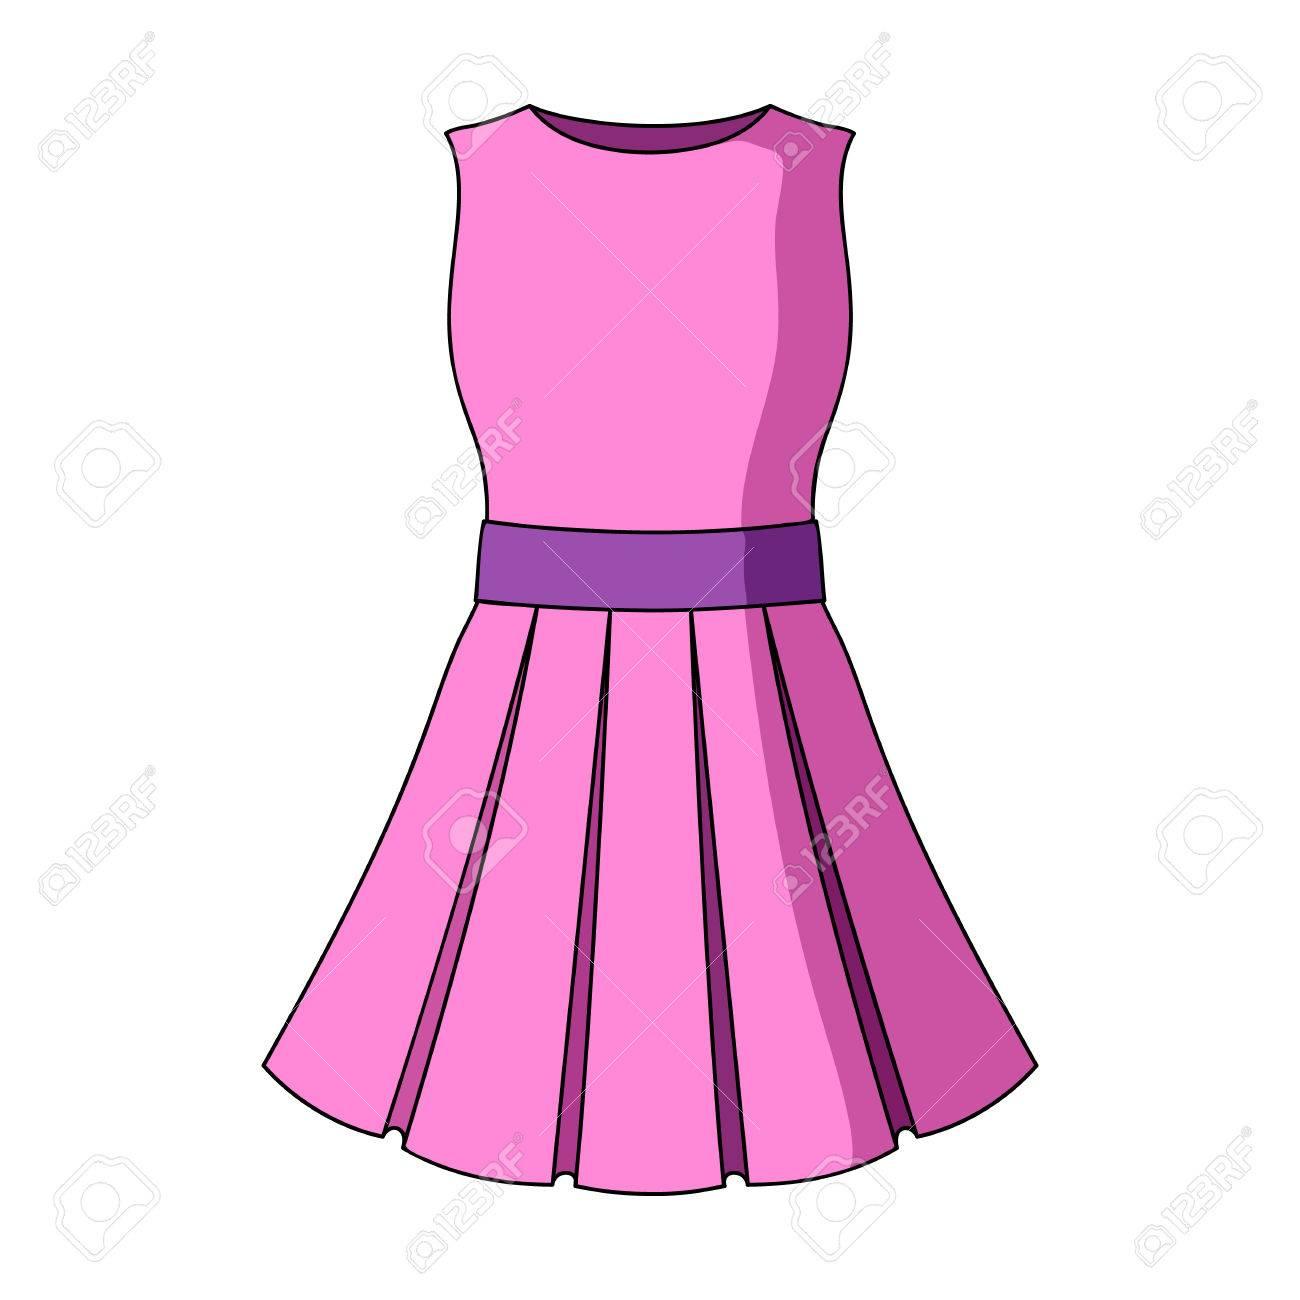 pink dress cartoon